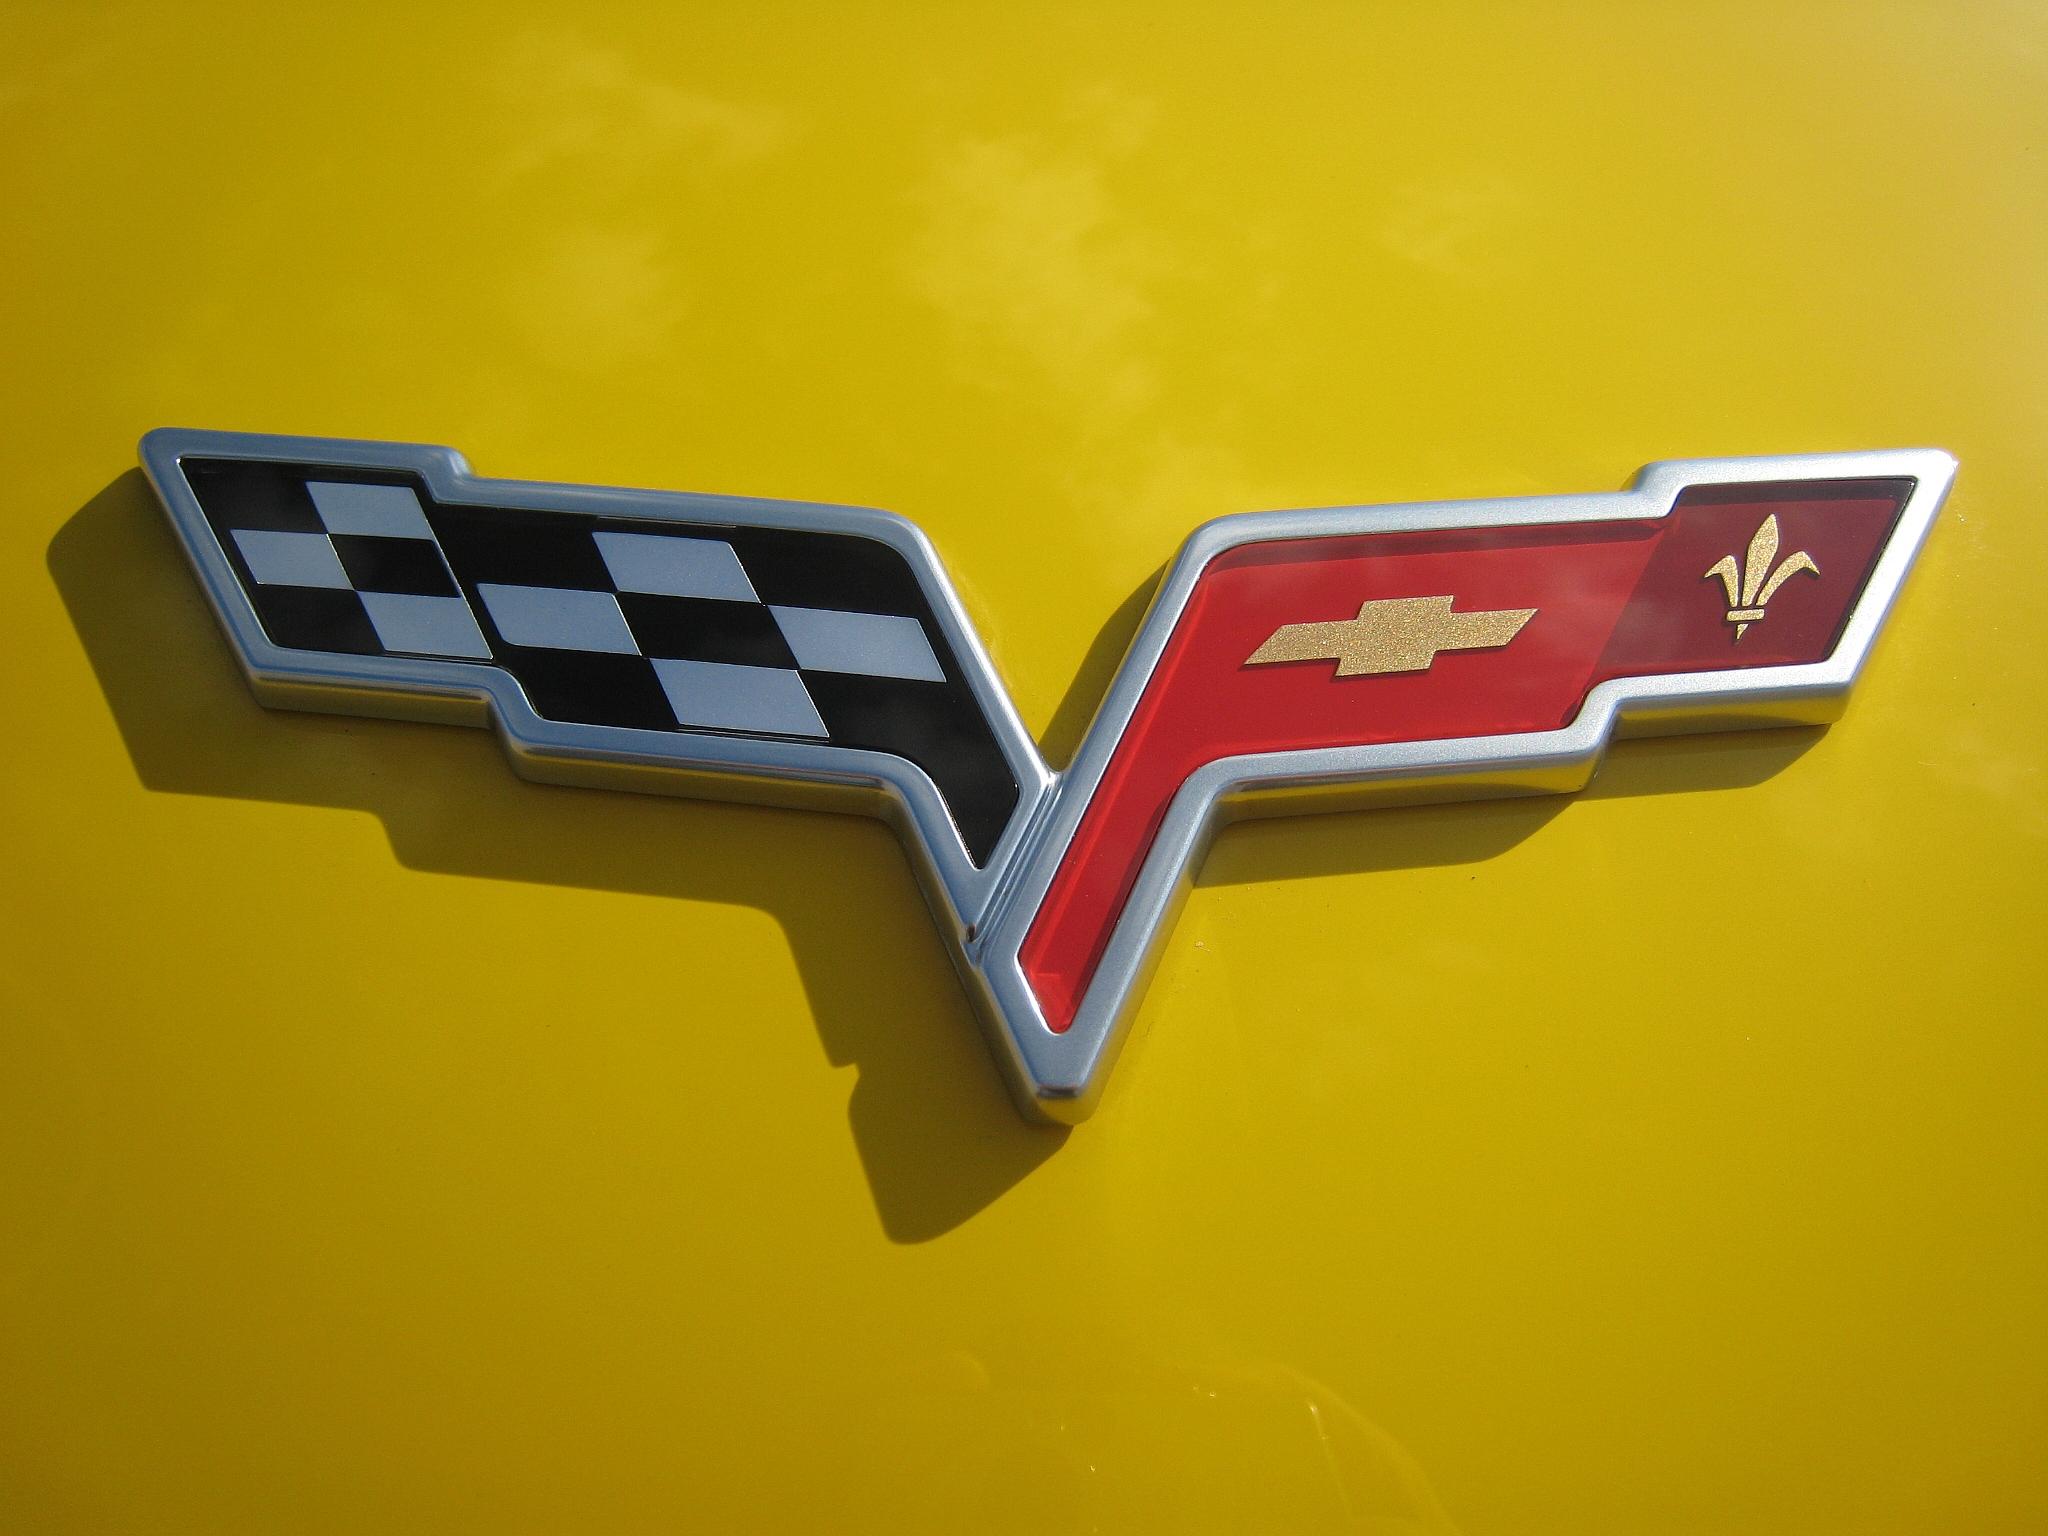 corvette logo corvette logo corvette logo corvette logo corvette logo 2048x1536